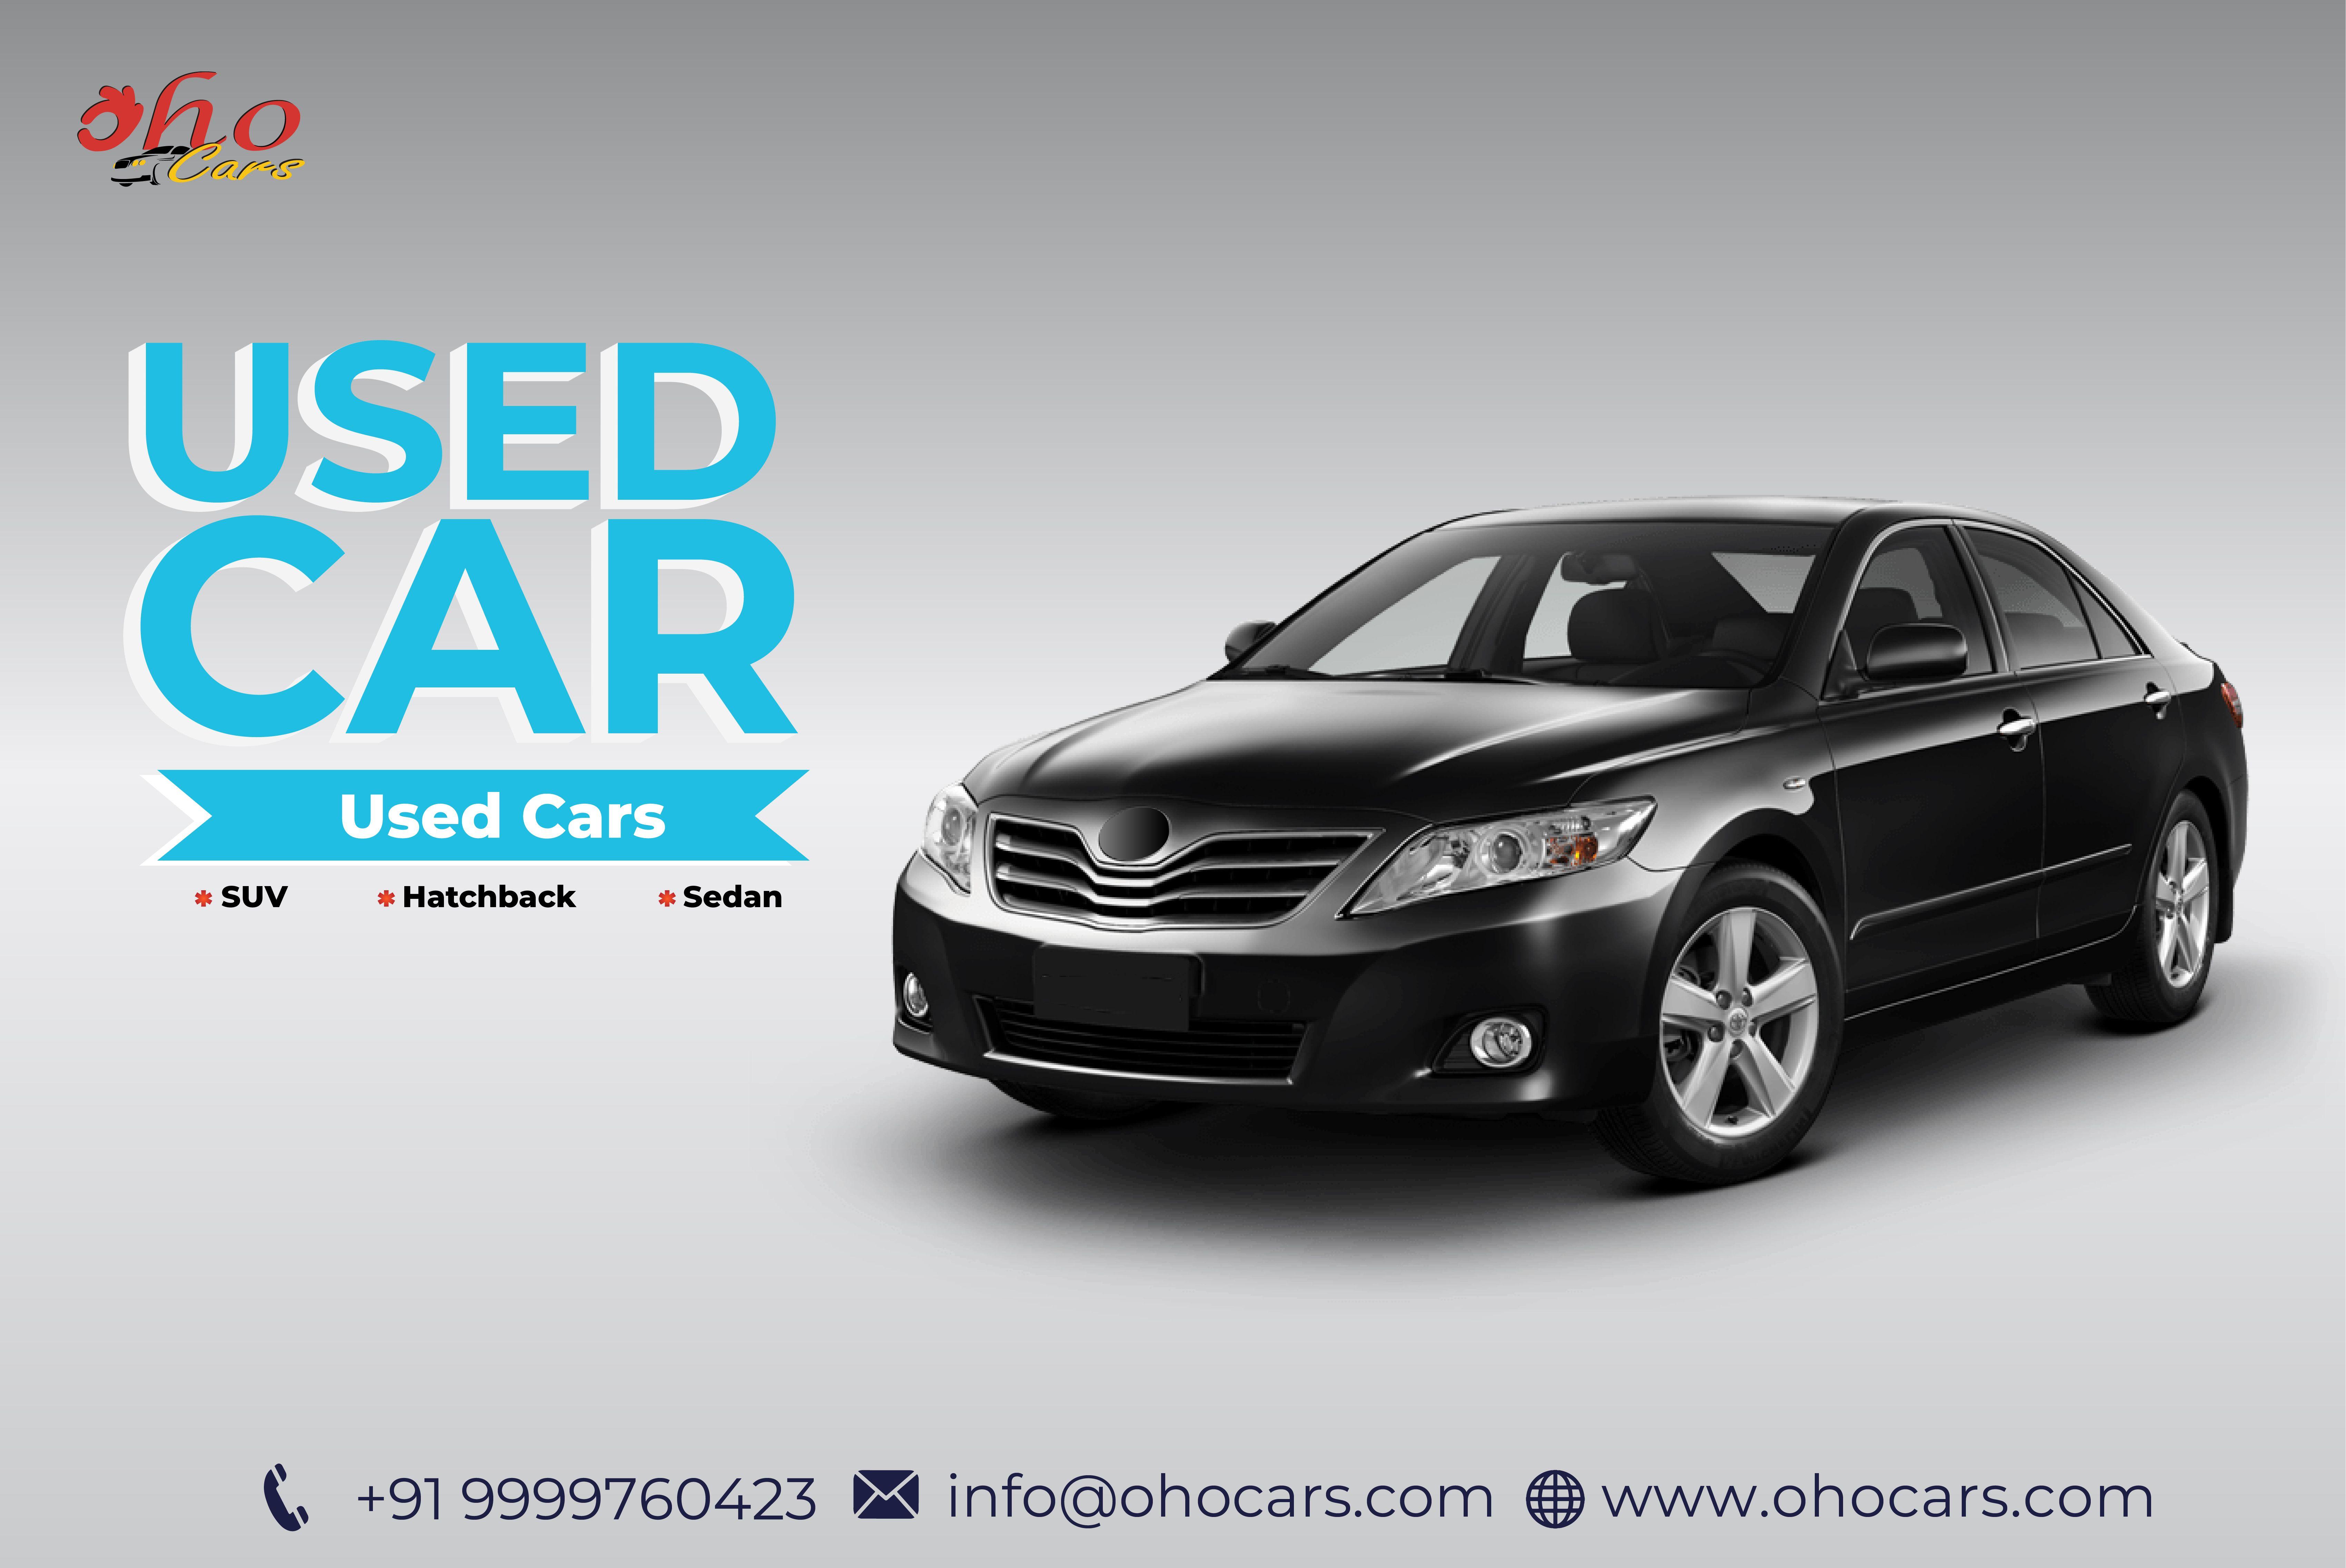 Honda Used Car image by ohocars Used cars, Car, Sedan